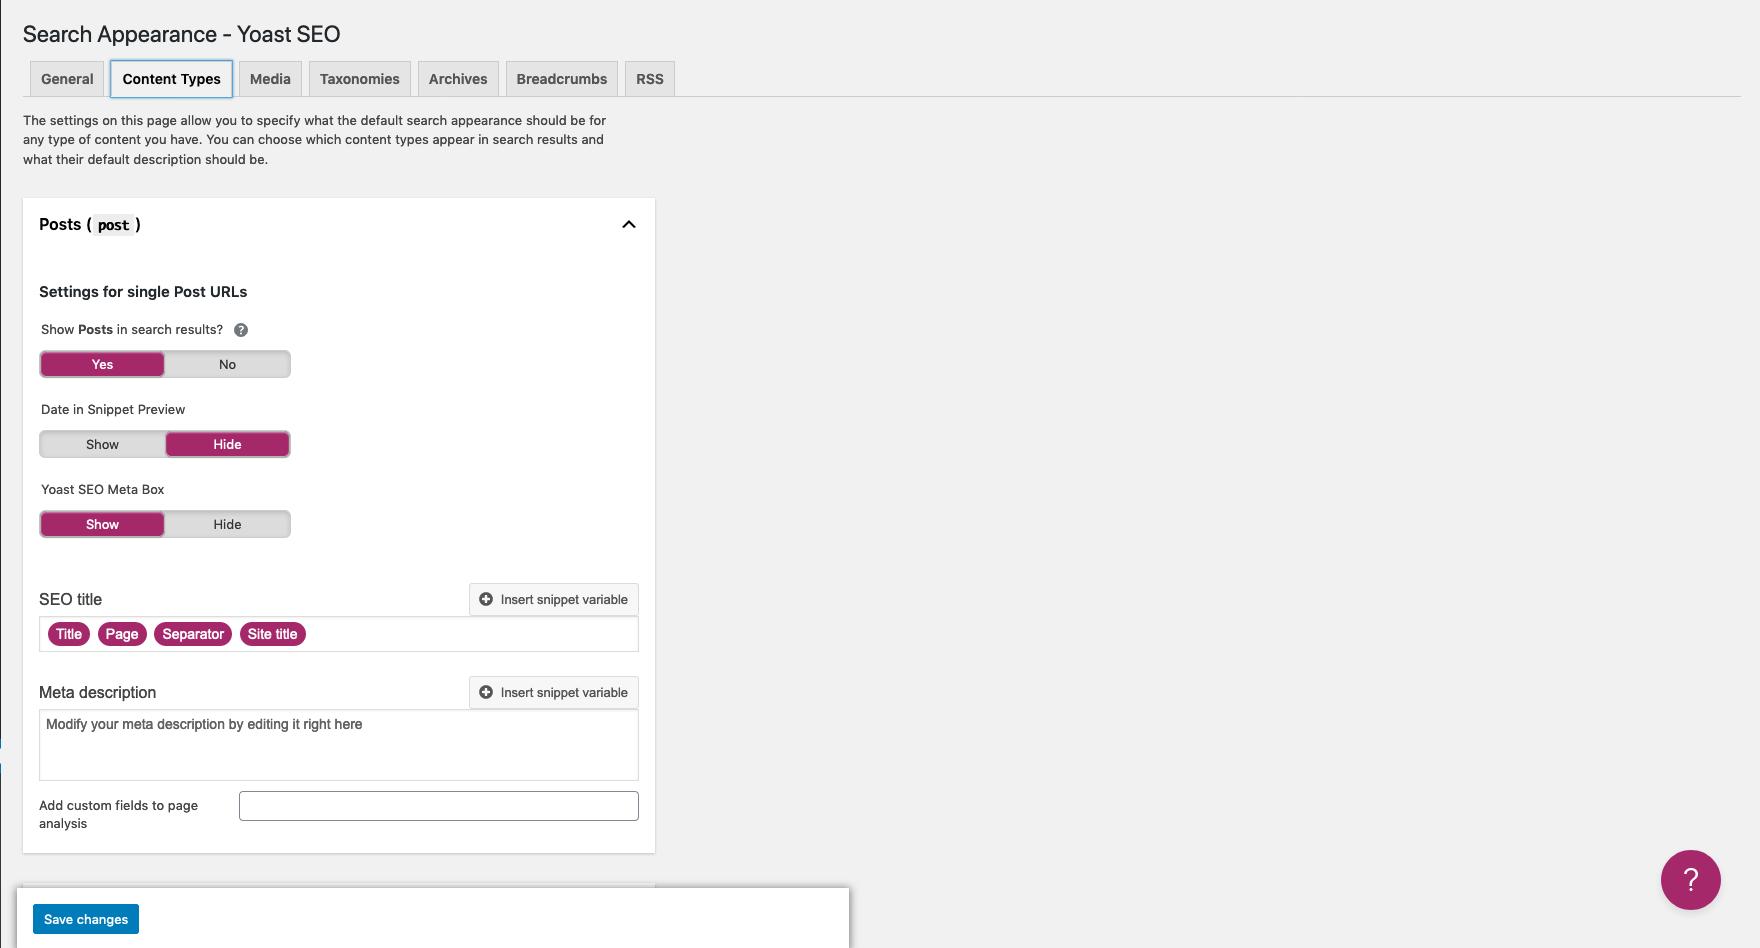 A screenshot of the Yoast SEO widget